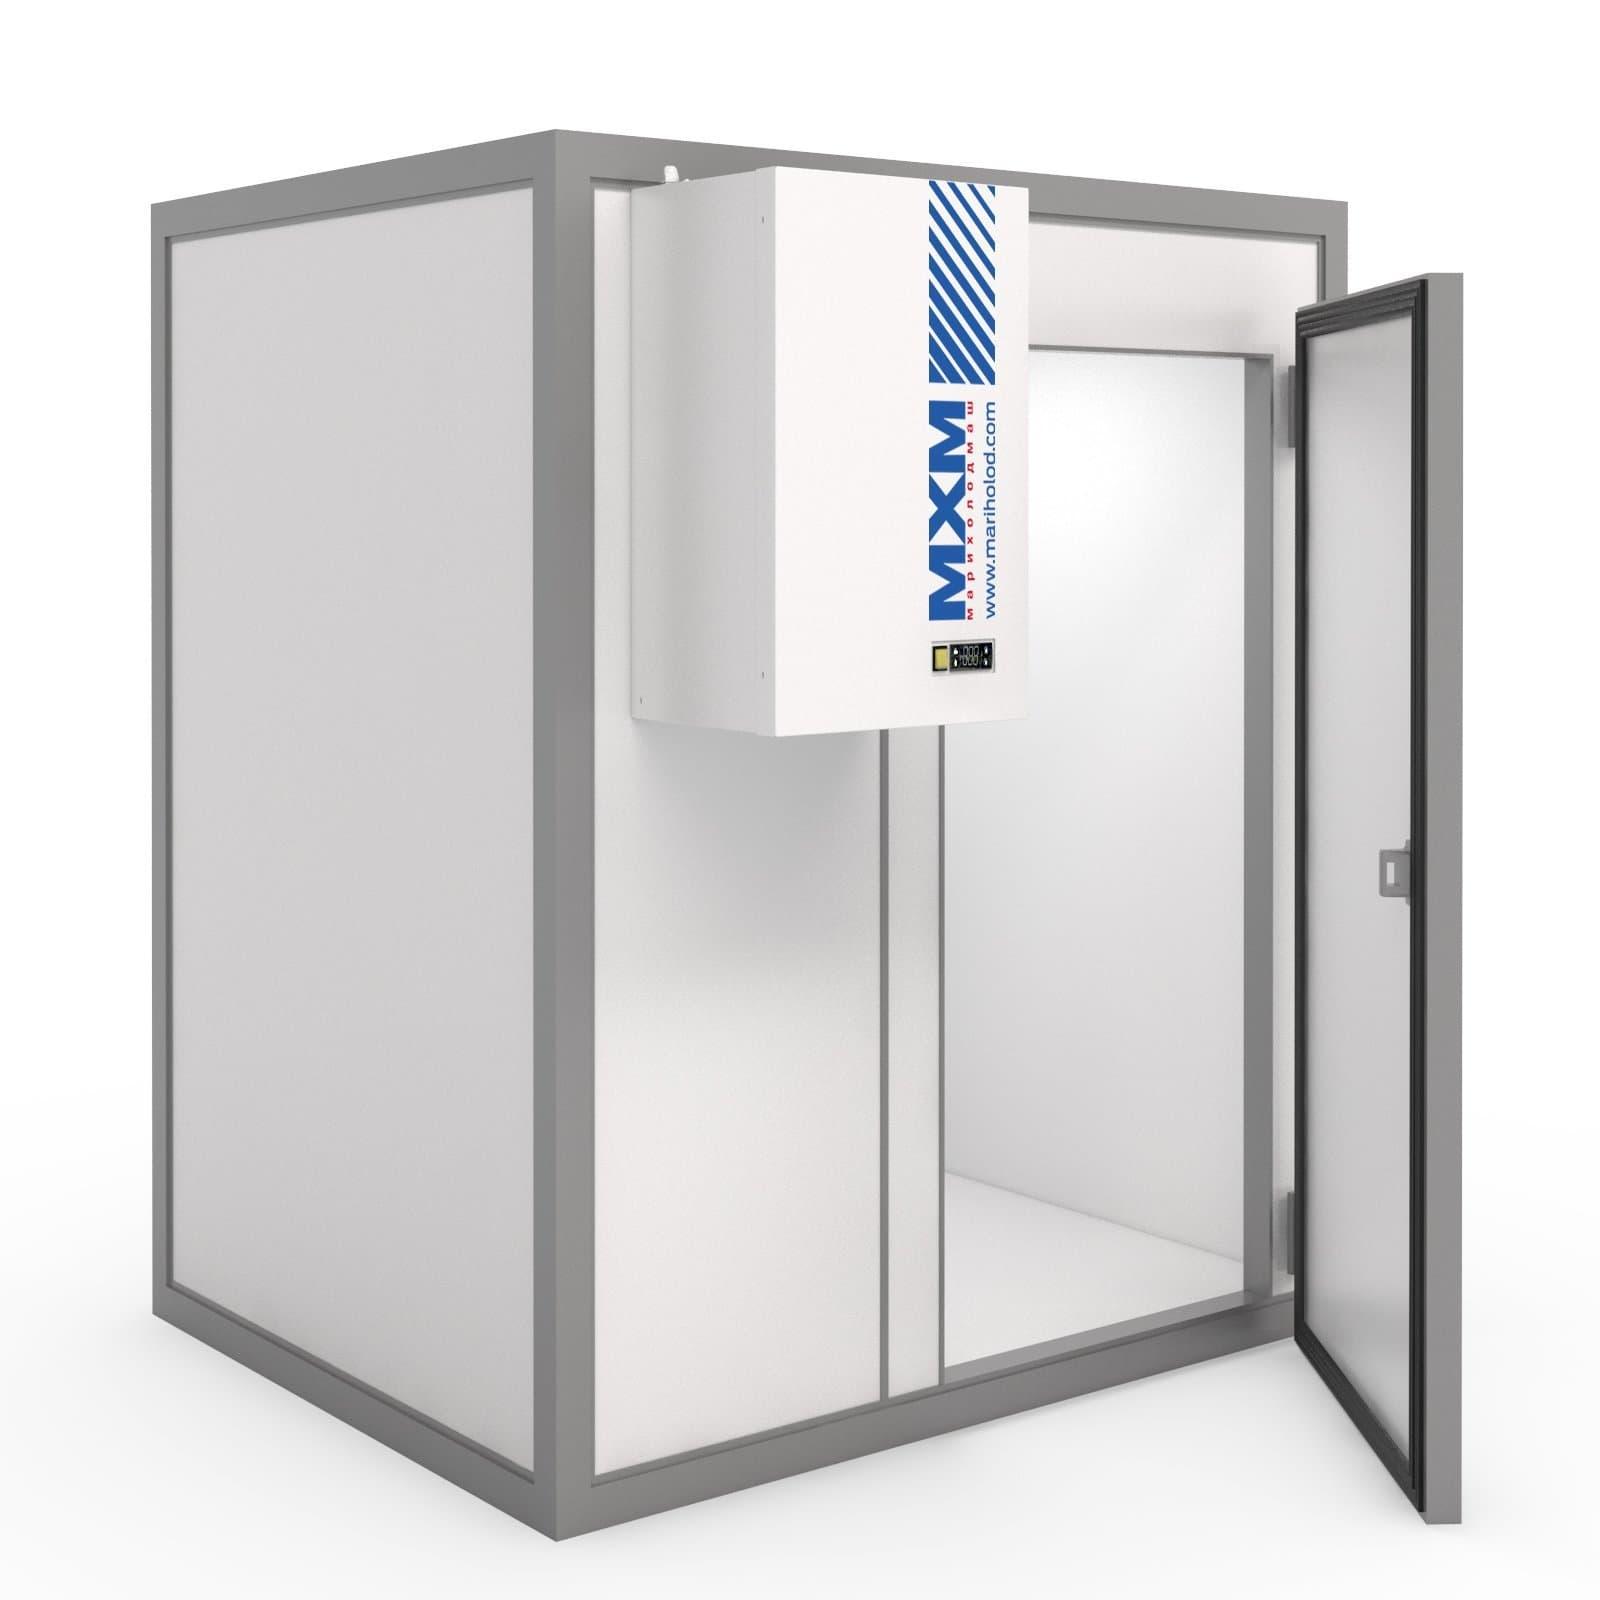 Камера холодильная МХМ КХН-19,83 1360×8260×2200